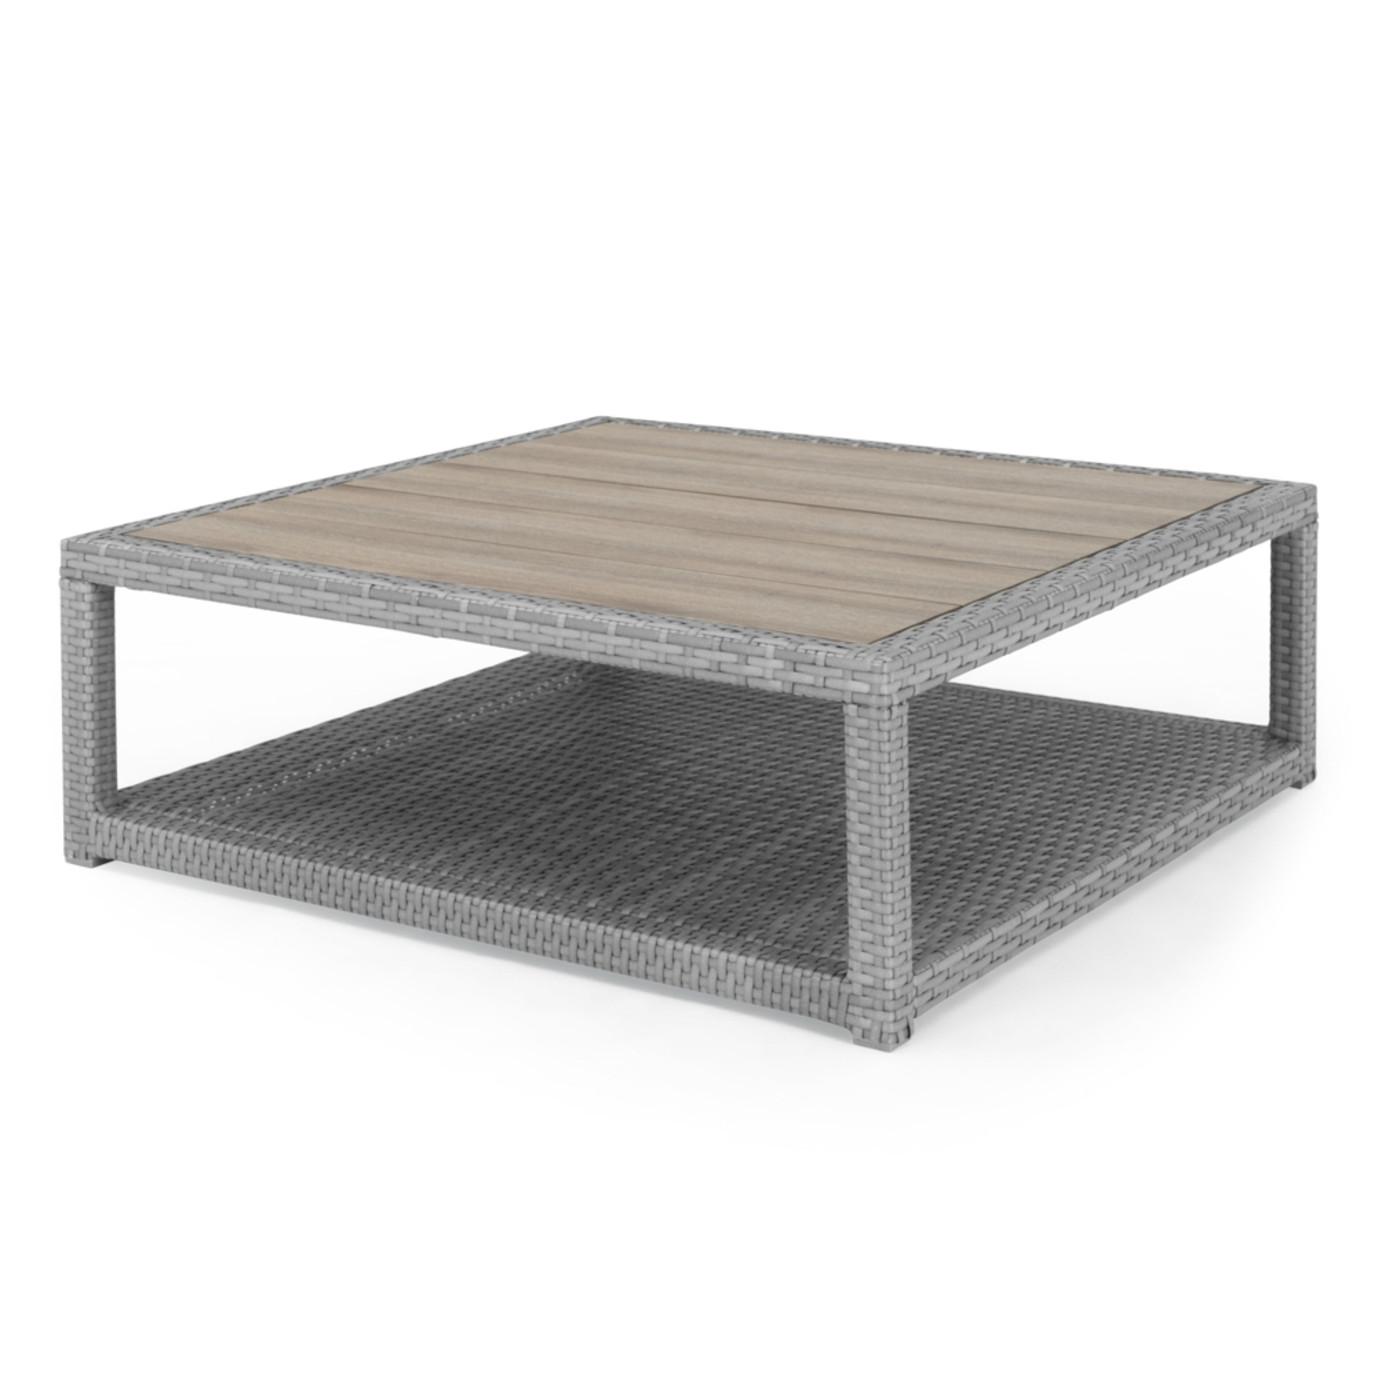 Portofino® Comfort 6 Piece Wood Sectional Seating - Laguna Blue